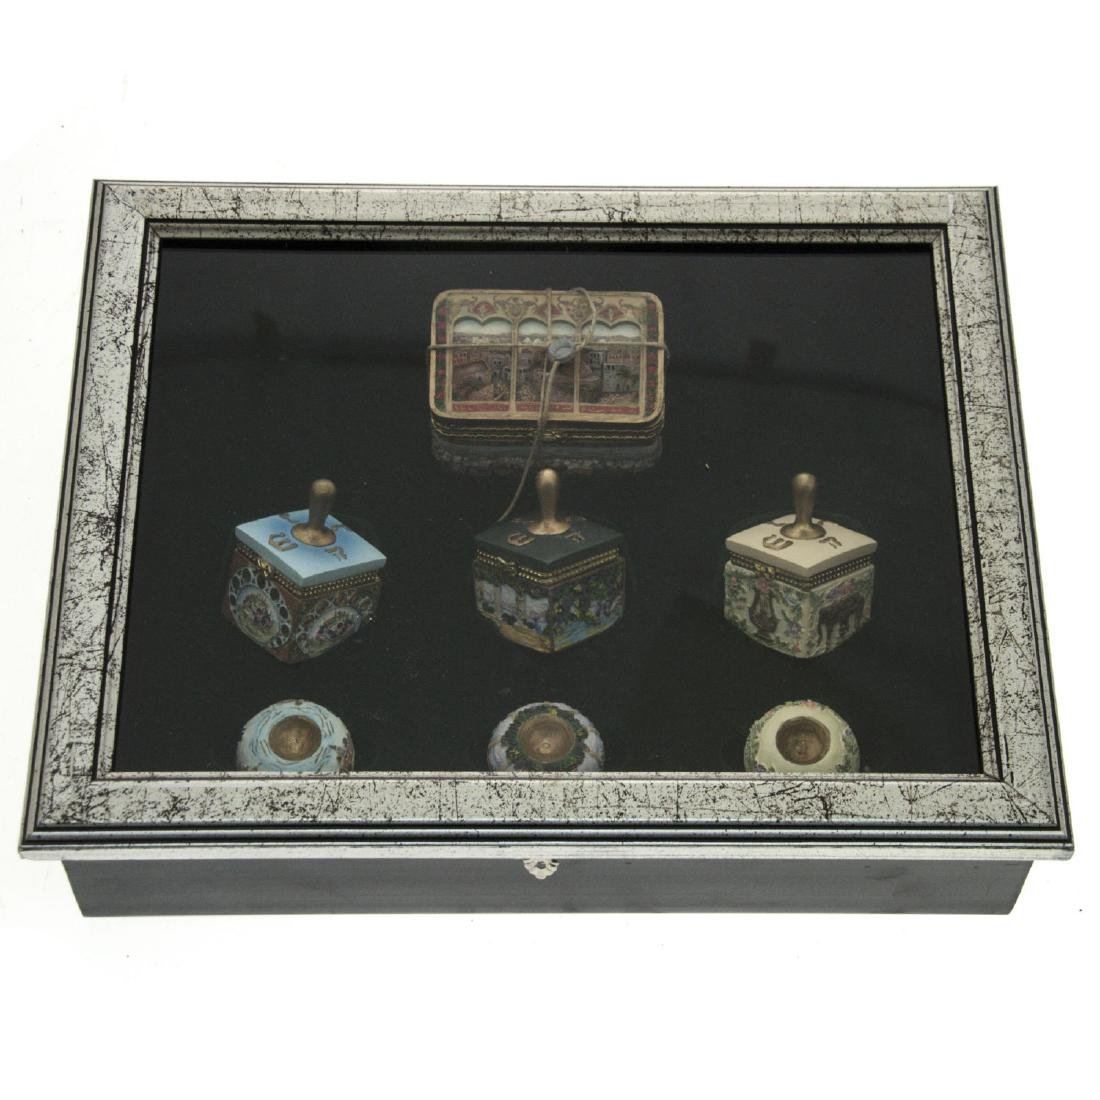 Set of 3 Artistic Dreidels and Hanukkah Gelt Box.